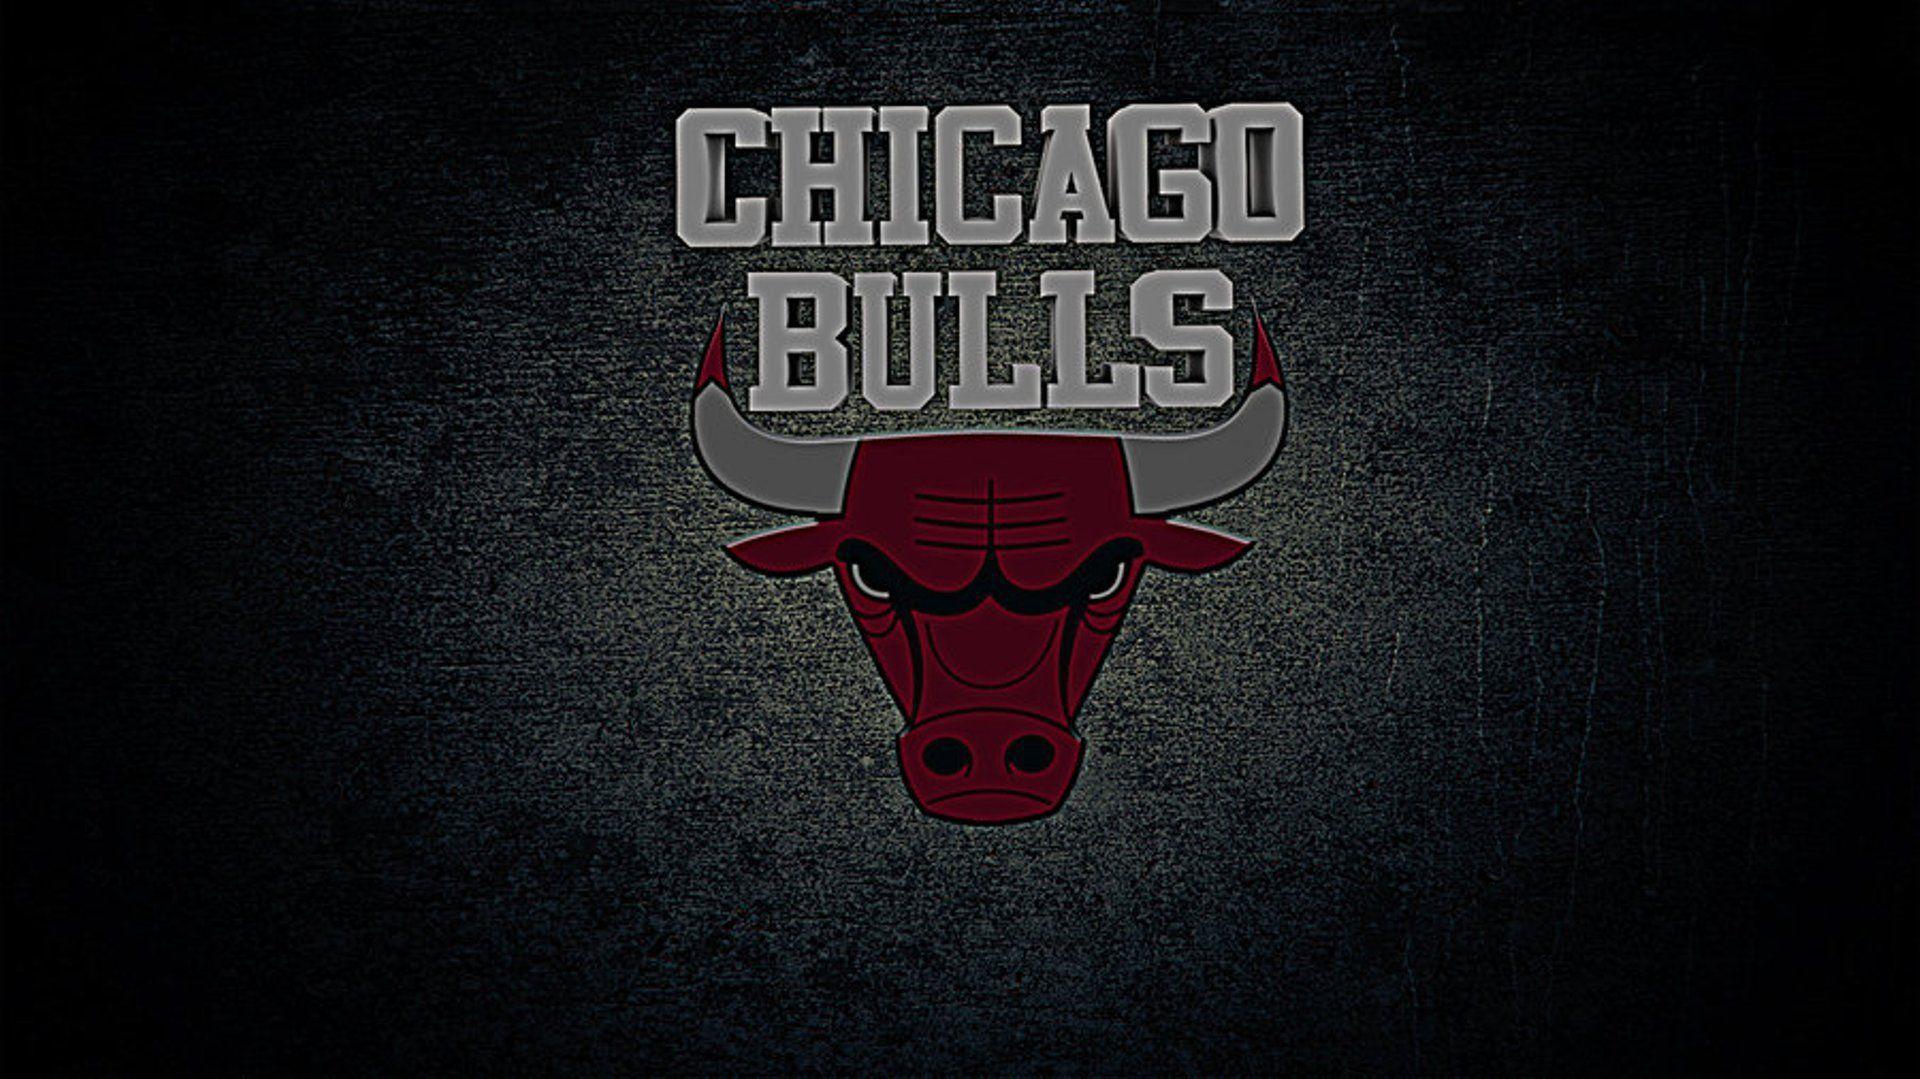 Chicago Bulls Logo Wallpaper Logo, Sport Wallpapers HD - Wallpapers HD